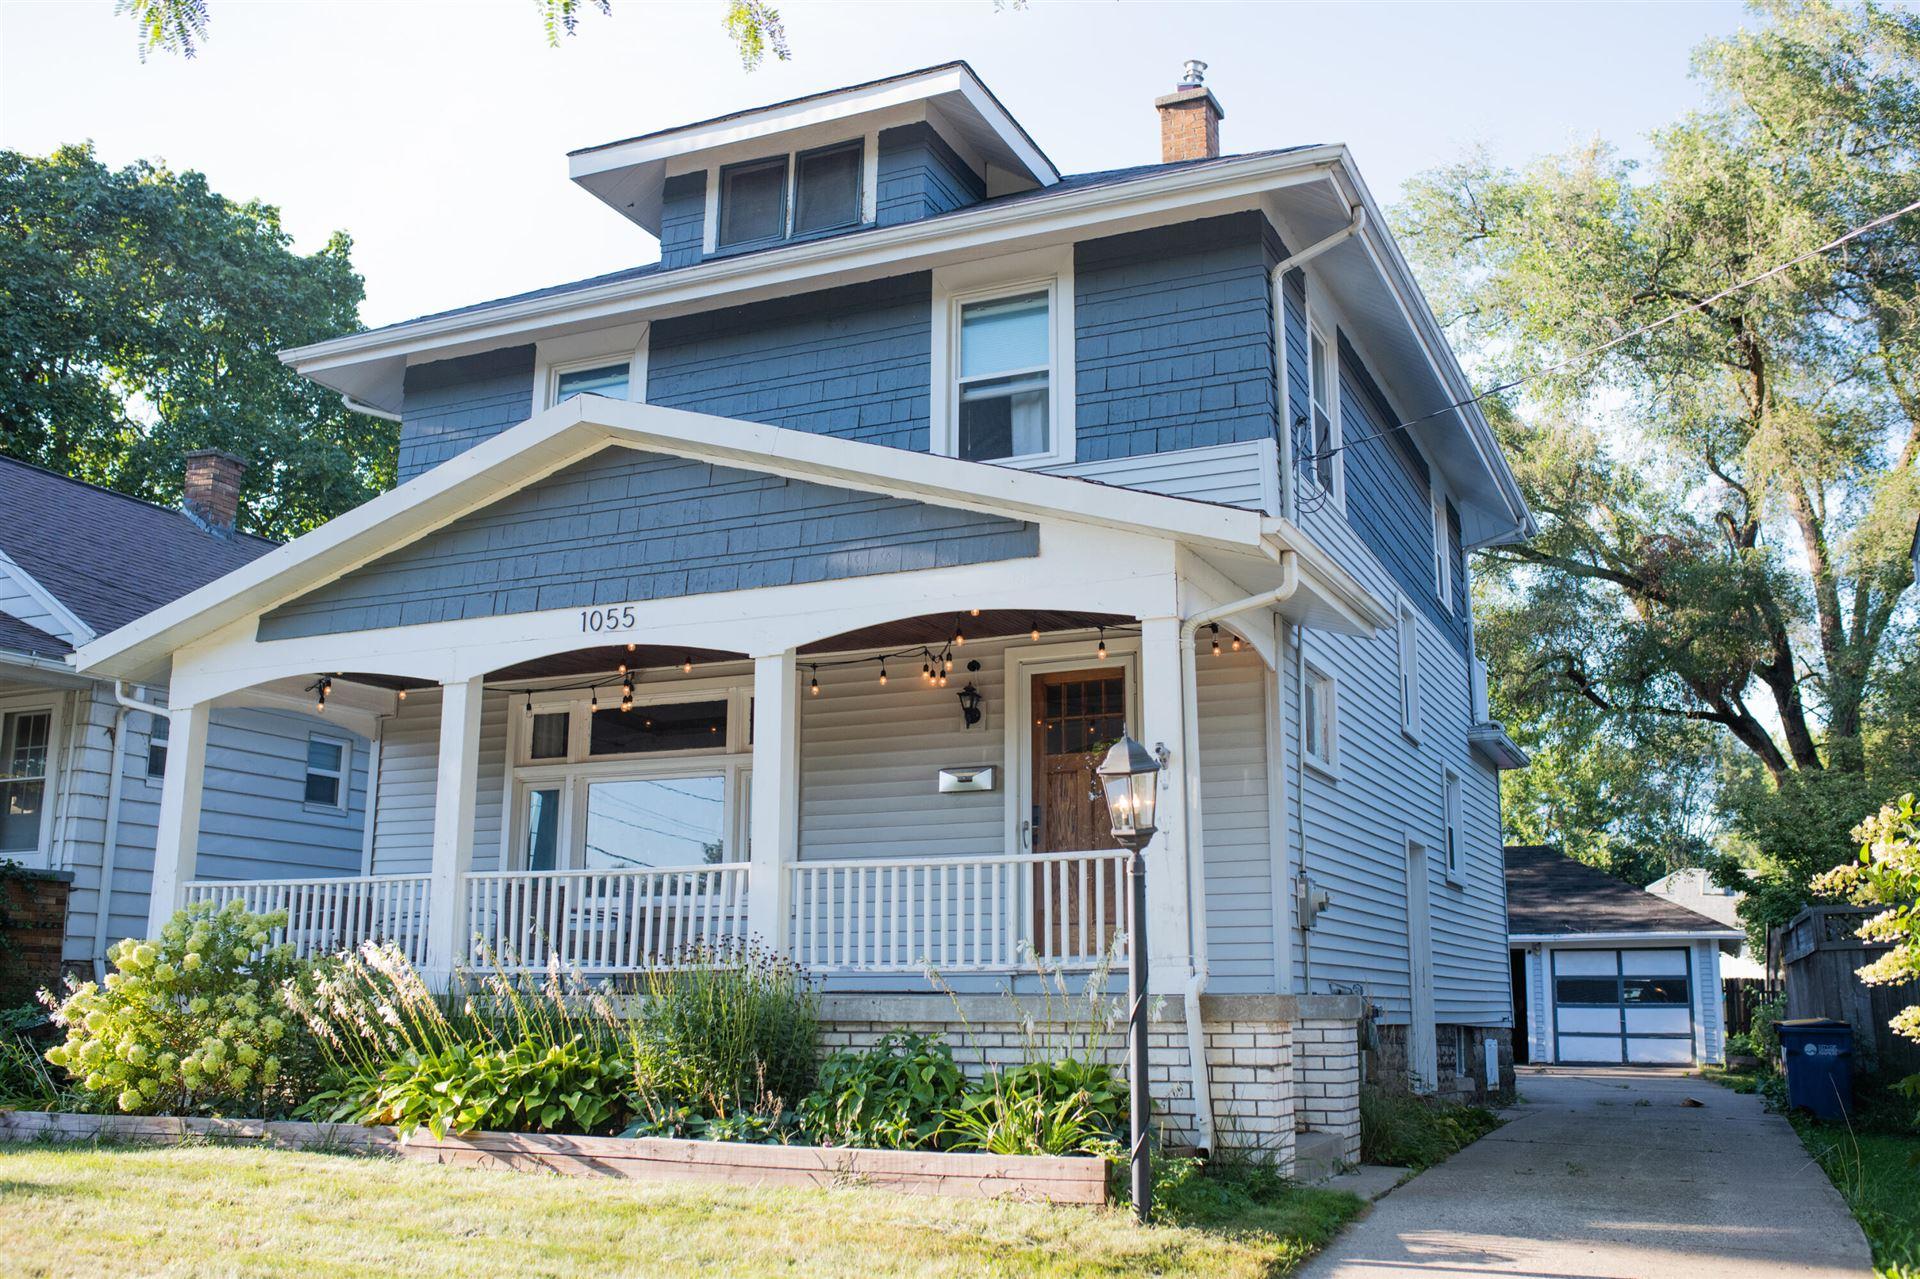 1055 Myrtle Street NW, Grand Rapids, MI 49504 - MLS#: 21112679